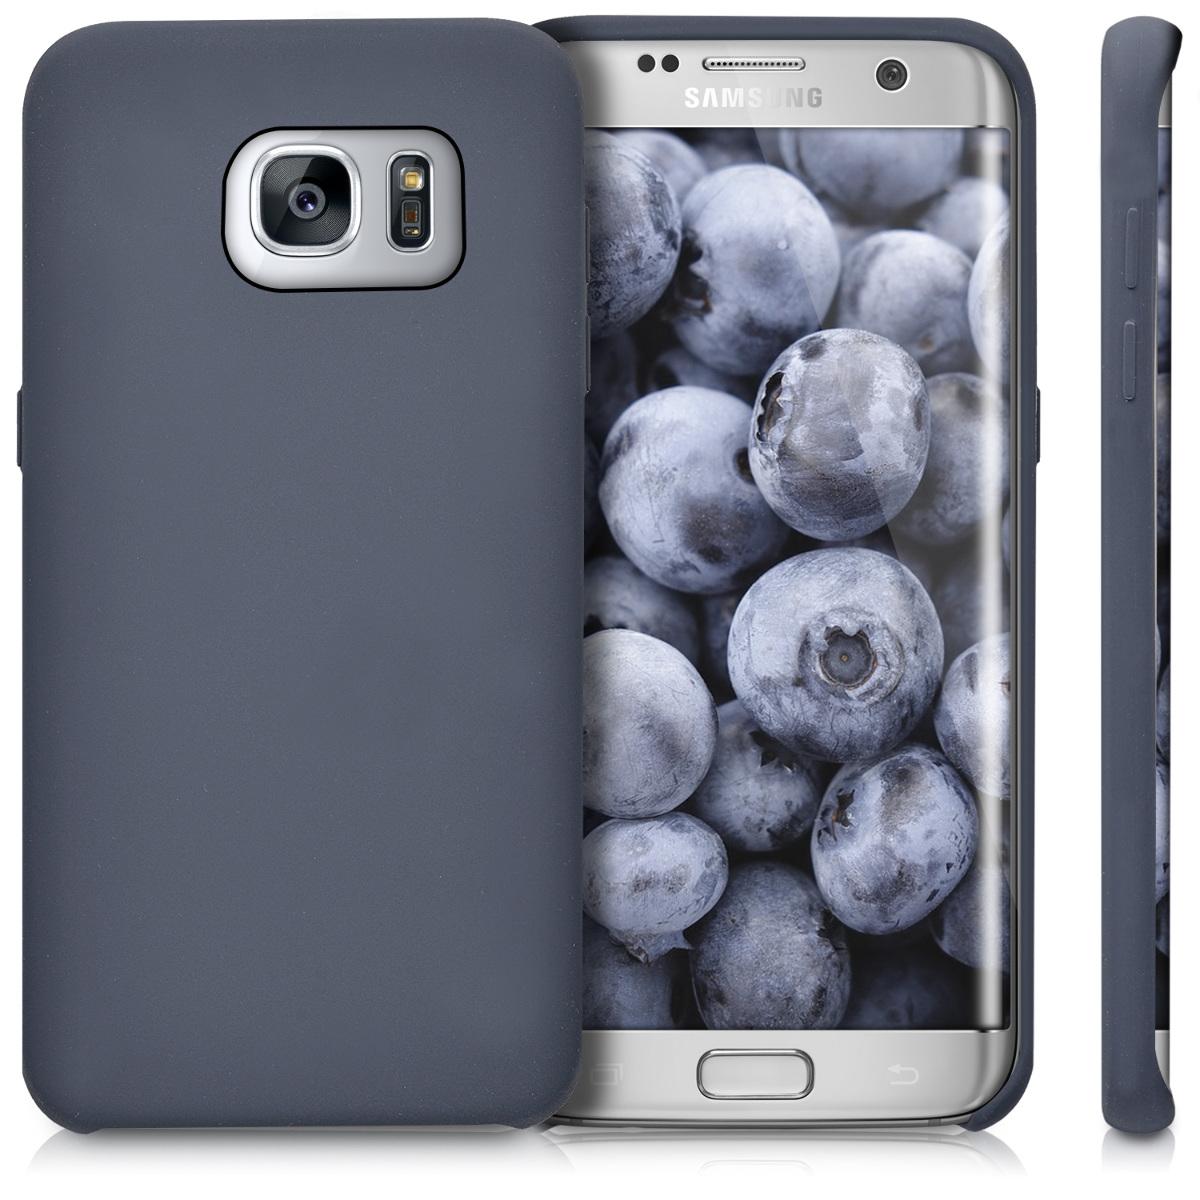 Silicone-Case-for-Samsung-Galaxy-S7-edge-TPU-Rubberized-Cover